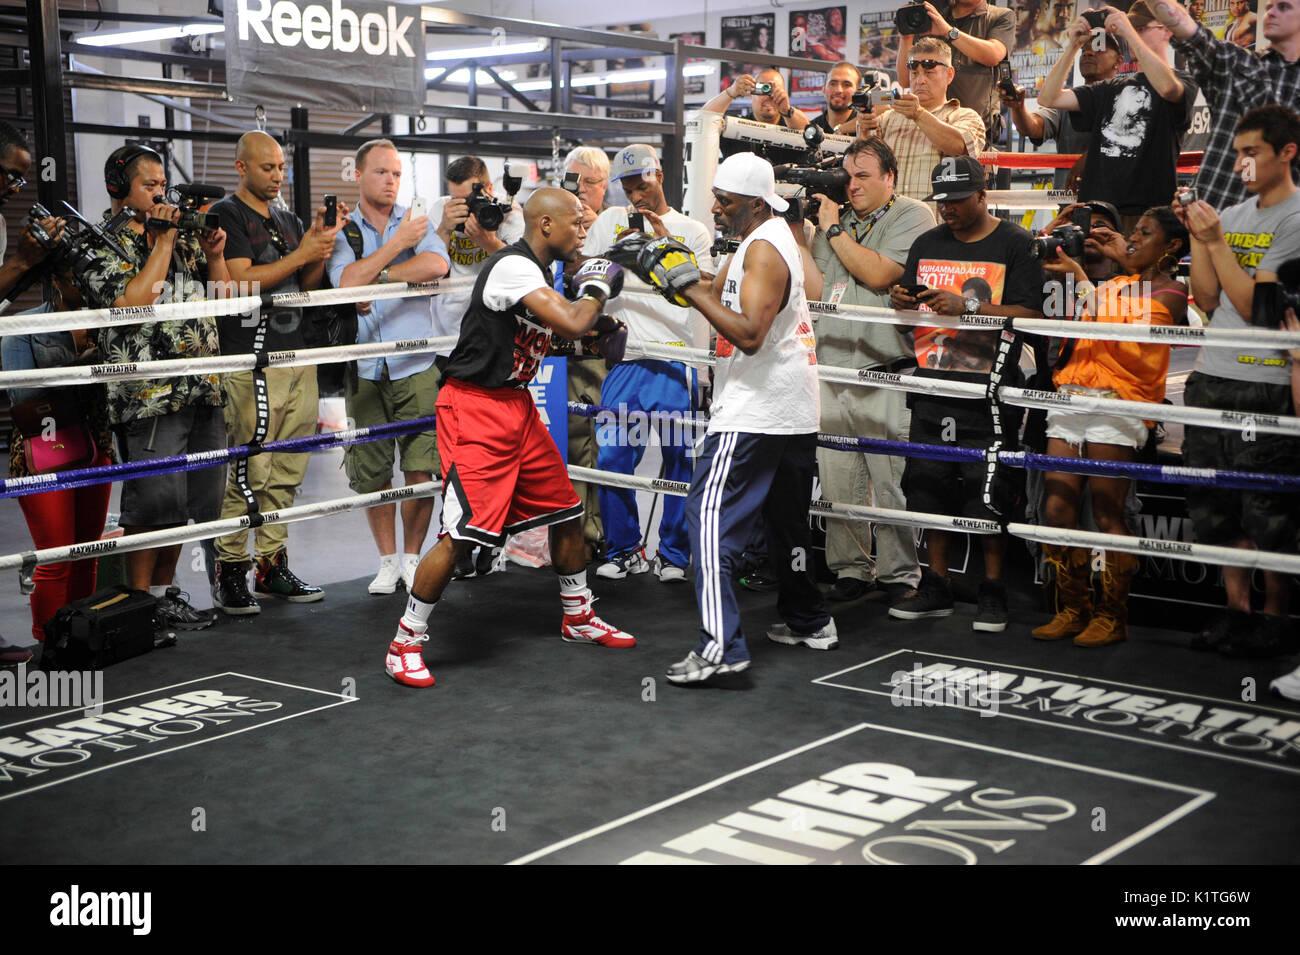 arrendamiento aeropuerto Intrusión  Boxer Floyd Mayweather Jr. trains front media Mayweather Boxing Gym Stock  Photo - Alamy